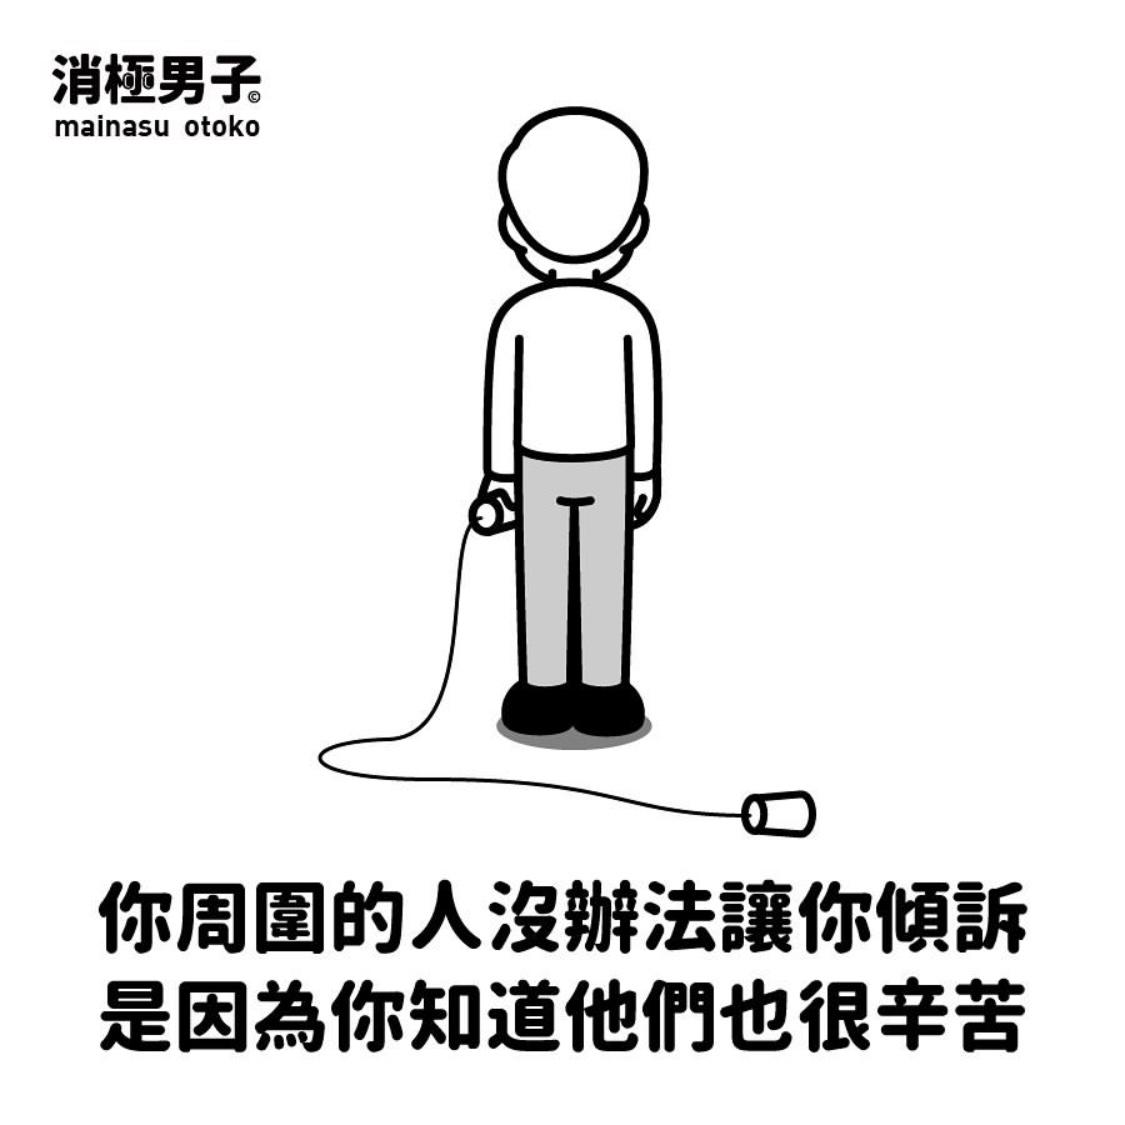 https://upload.cc/i1/2021/05/01/fgQqV6.jpeg